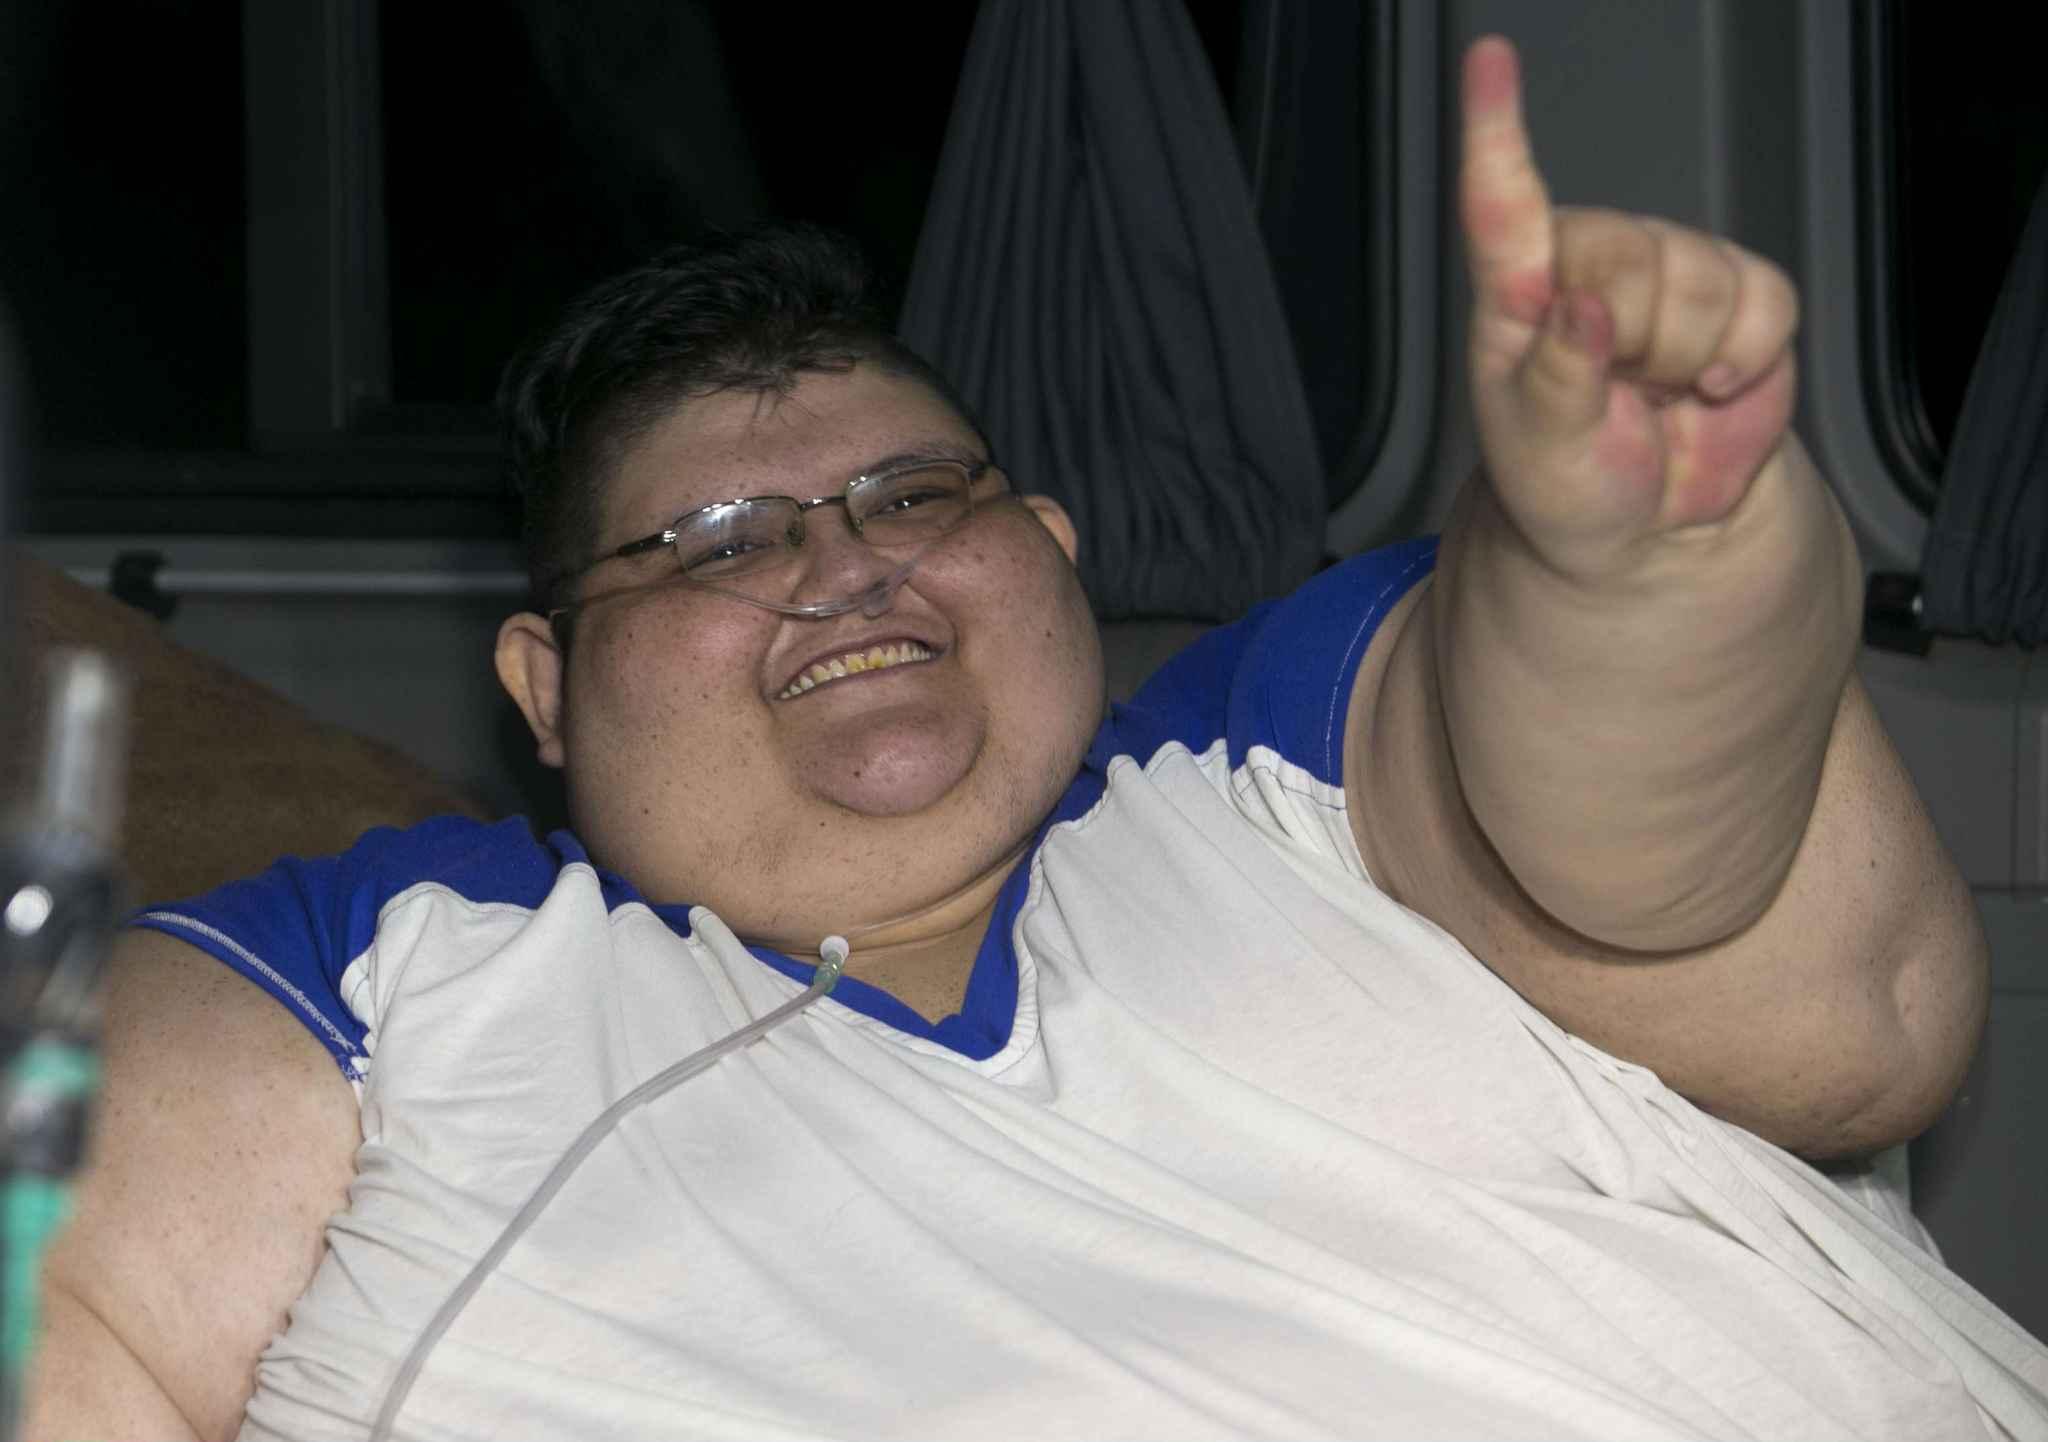 l 39 homme le plus gros du monde voudrait perdre 300 kilos vid o afrikmag. Black Bedroom Furniture Sets. Home Design Ideas